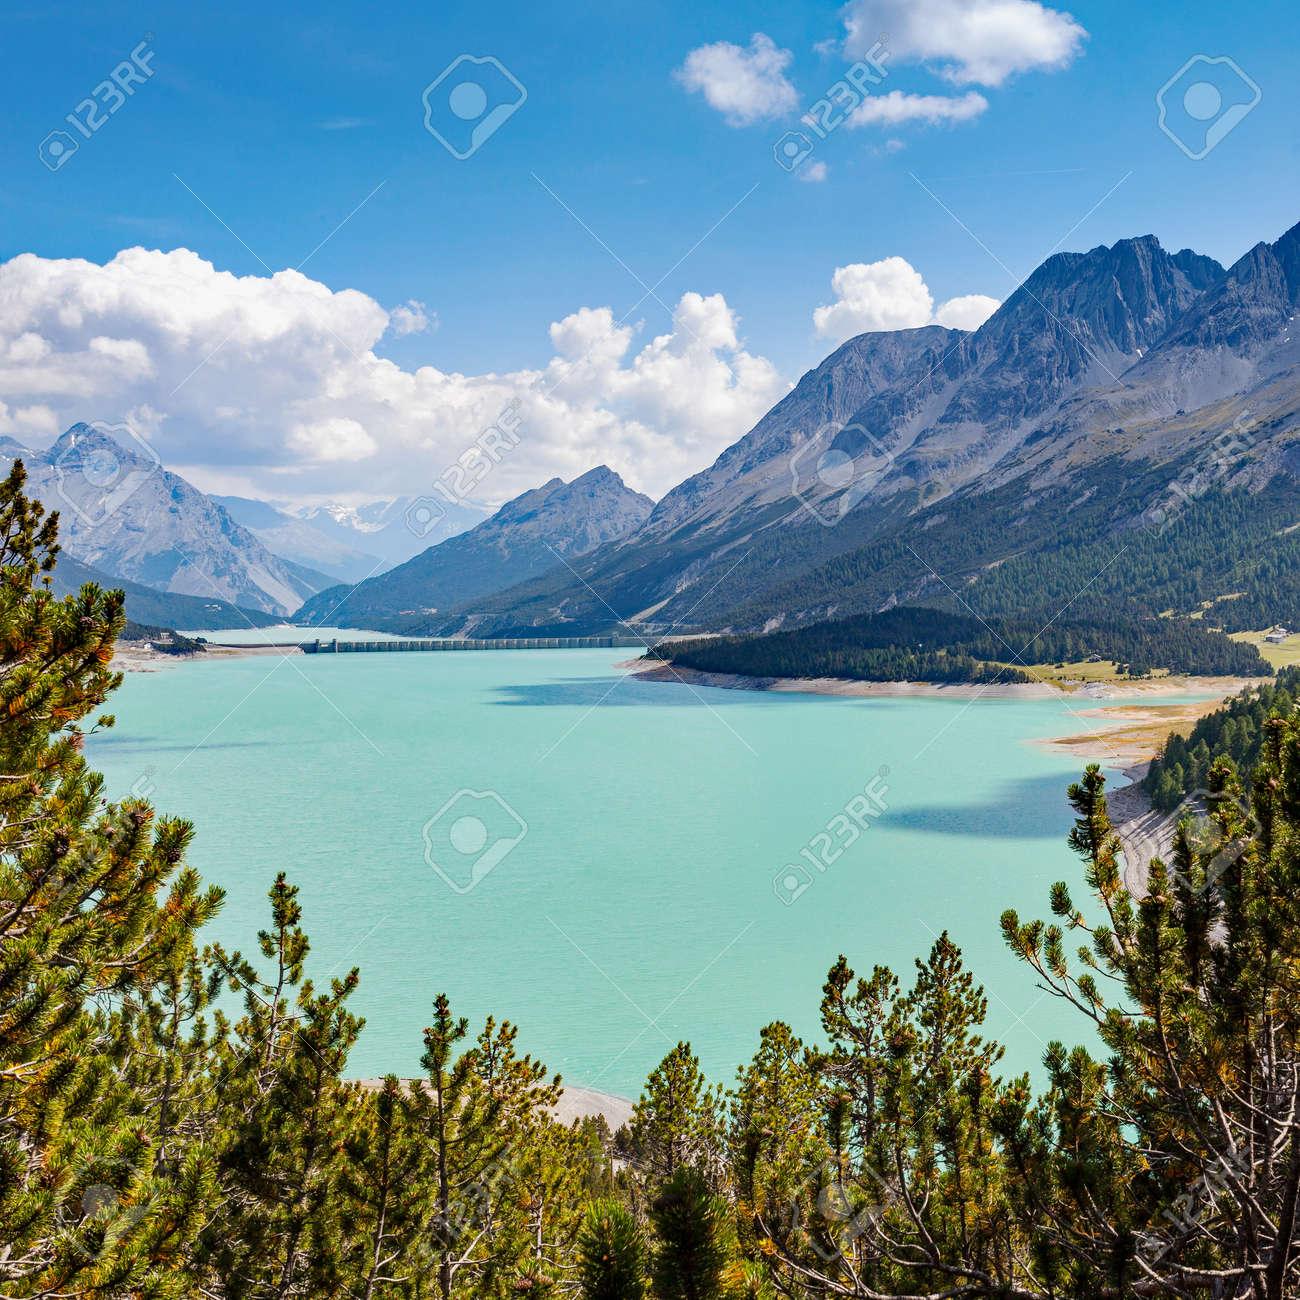 dam of Cancano - Bormio (IT) - 134974501